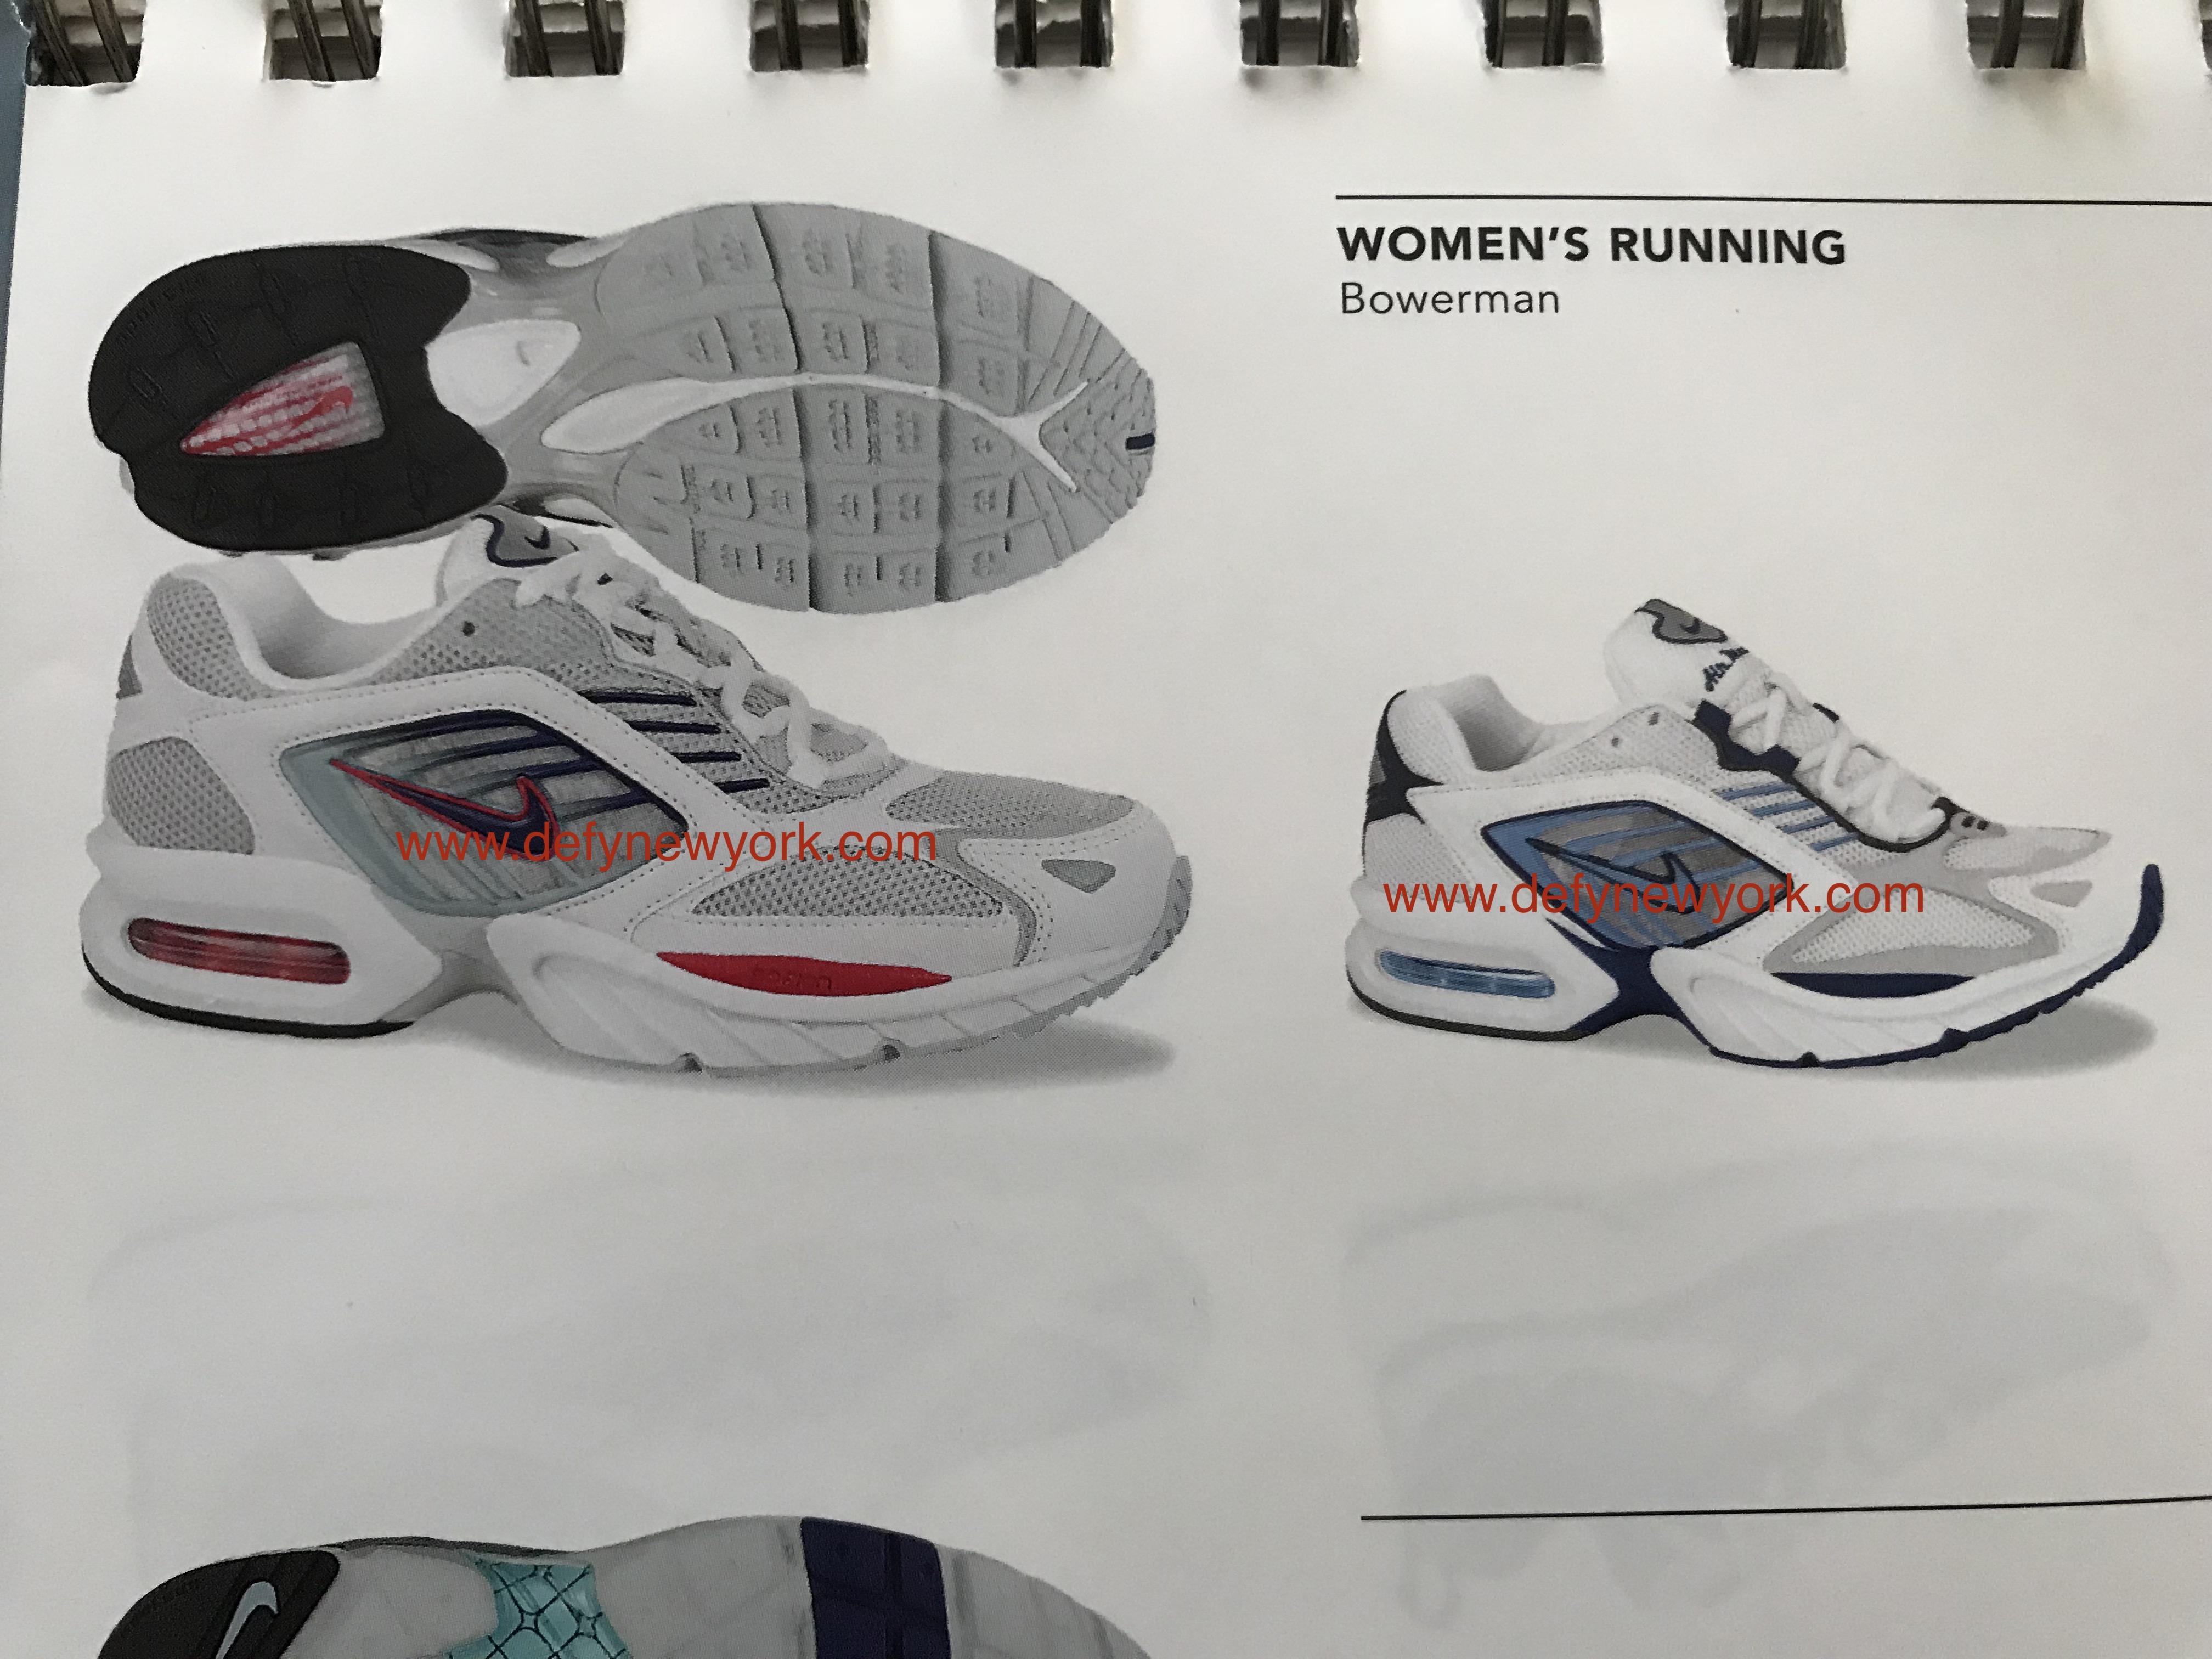 sitio pastel Inspirar  Nike Air Max Moto Running Shoe 2003